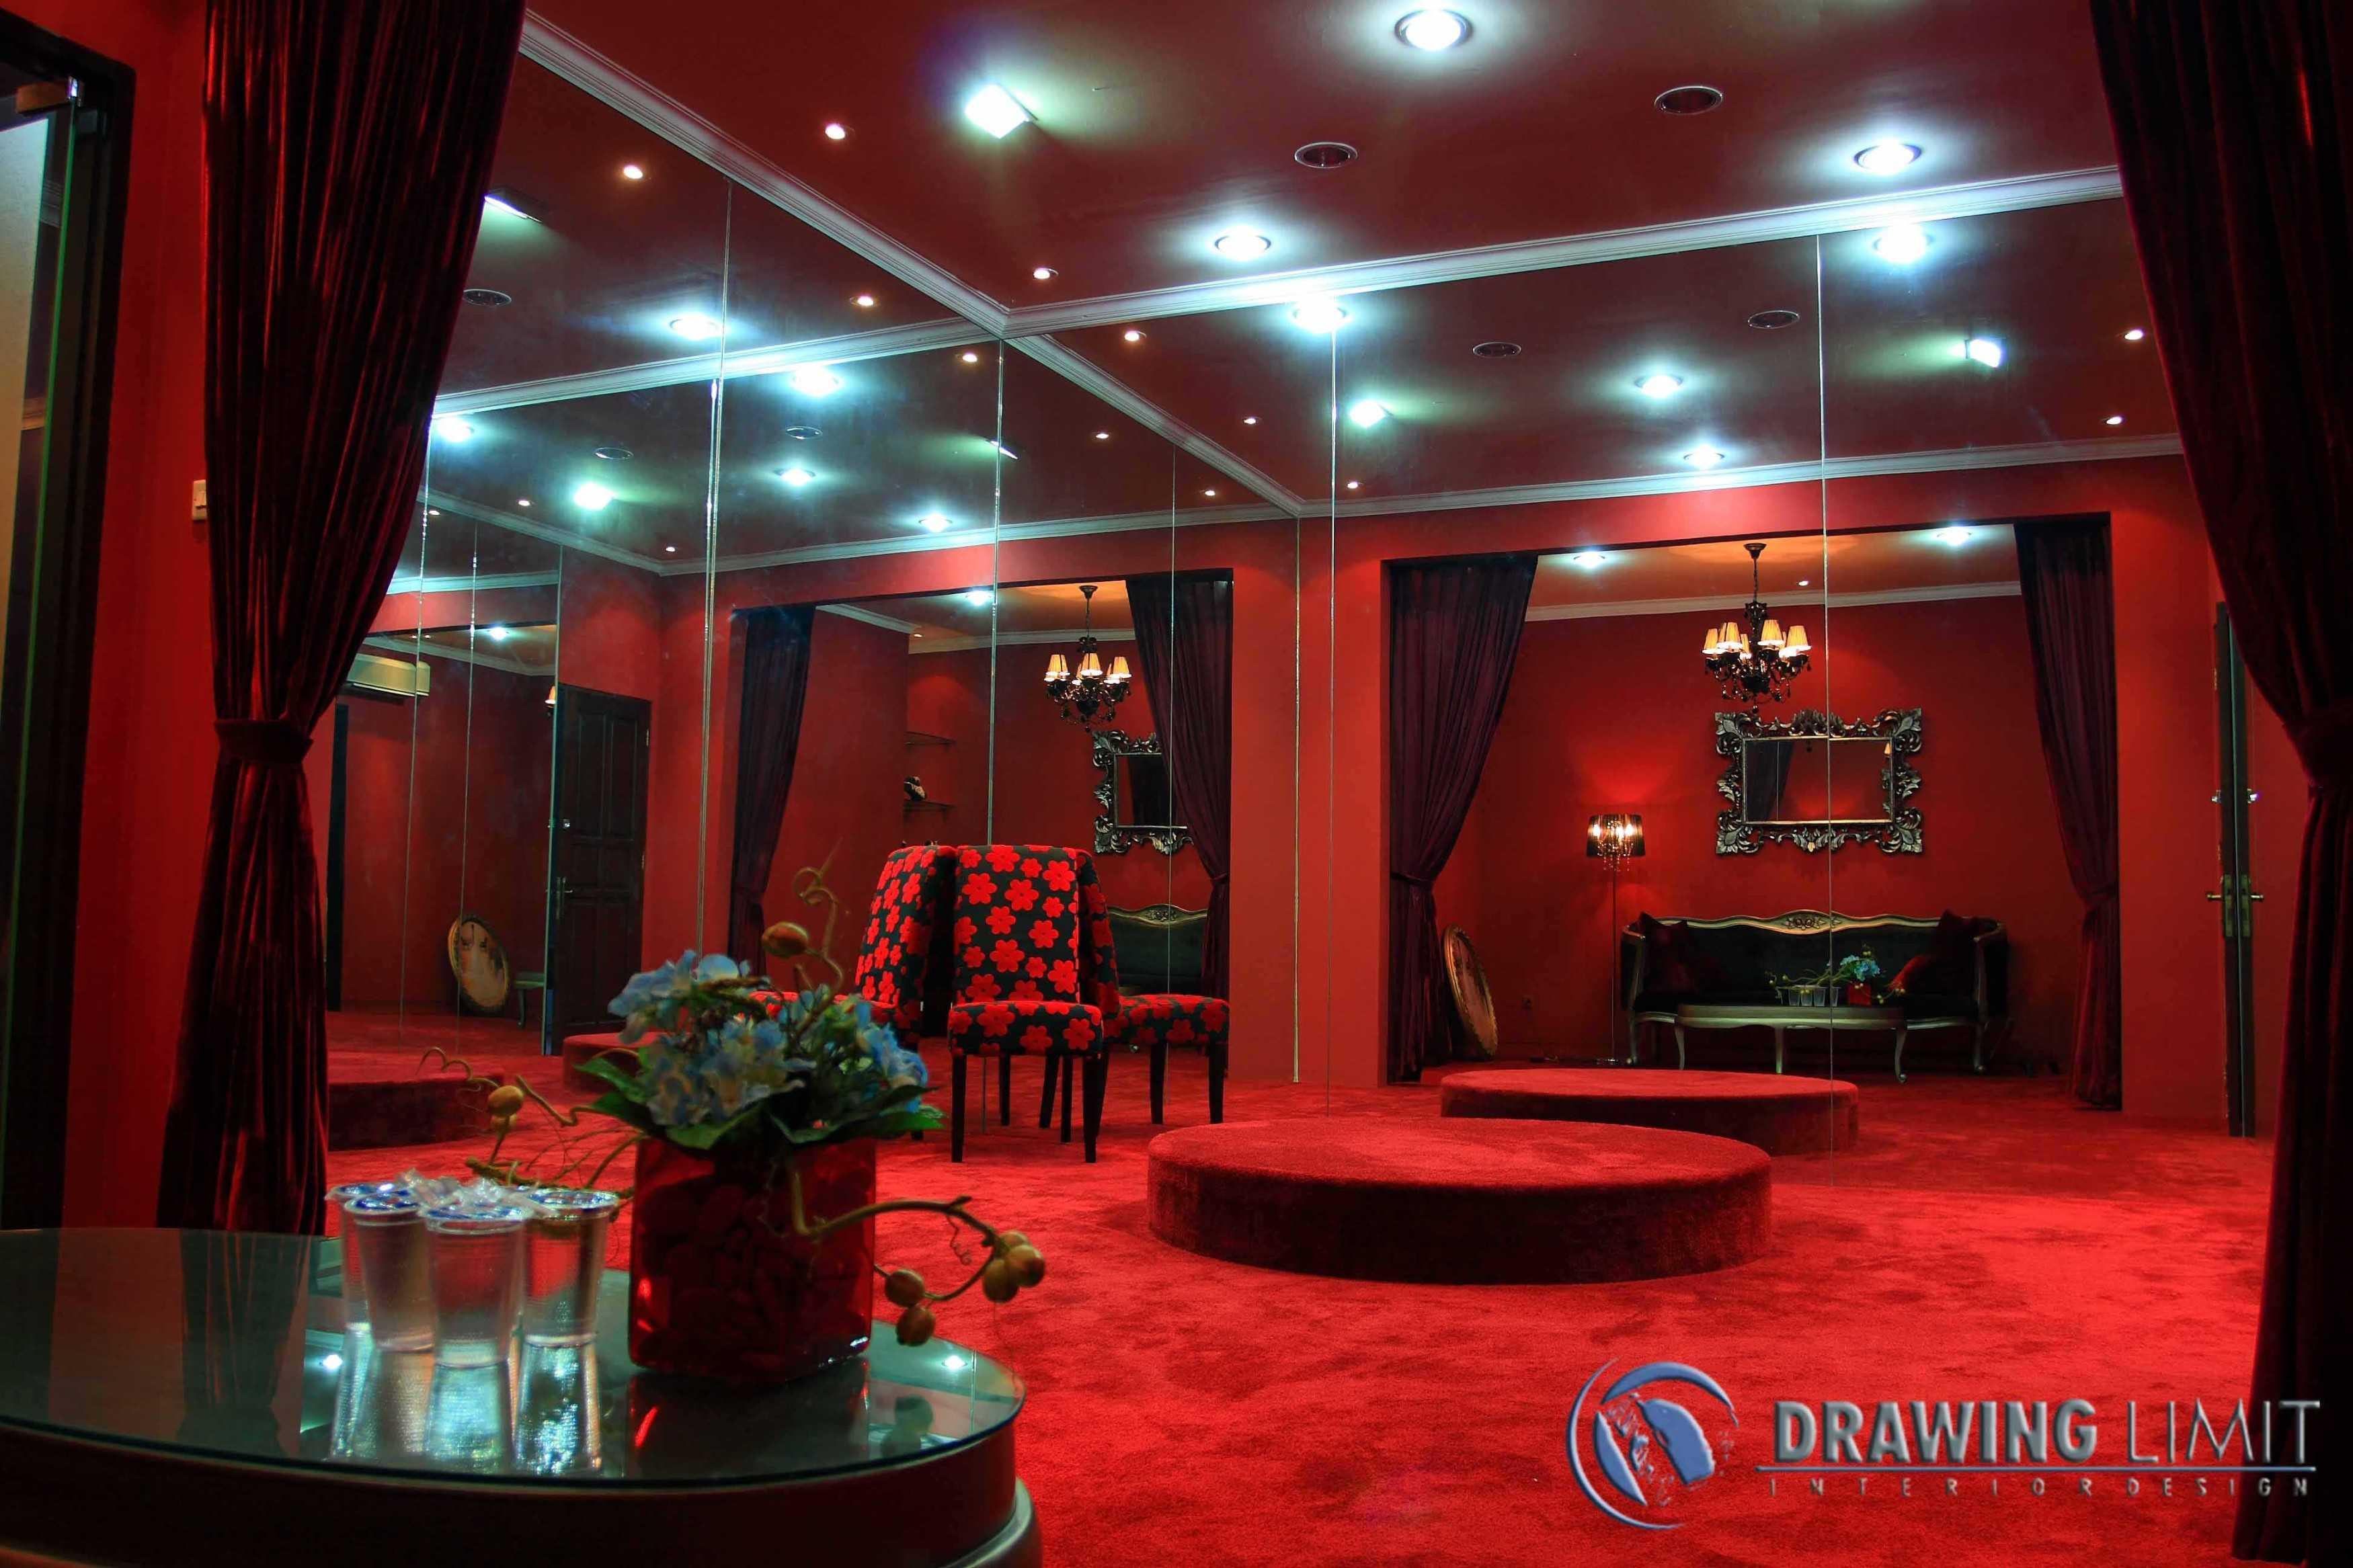 Budi Zhou Bridal Altura Surabaya City, East Java, Indonesia Surabaya City, East Java, Indonesia Salon008 Klasik  32400